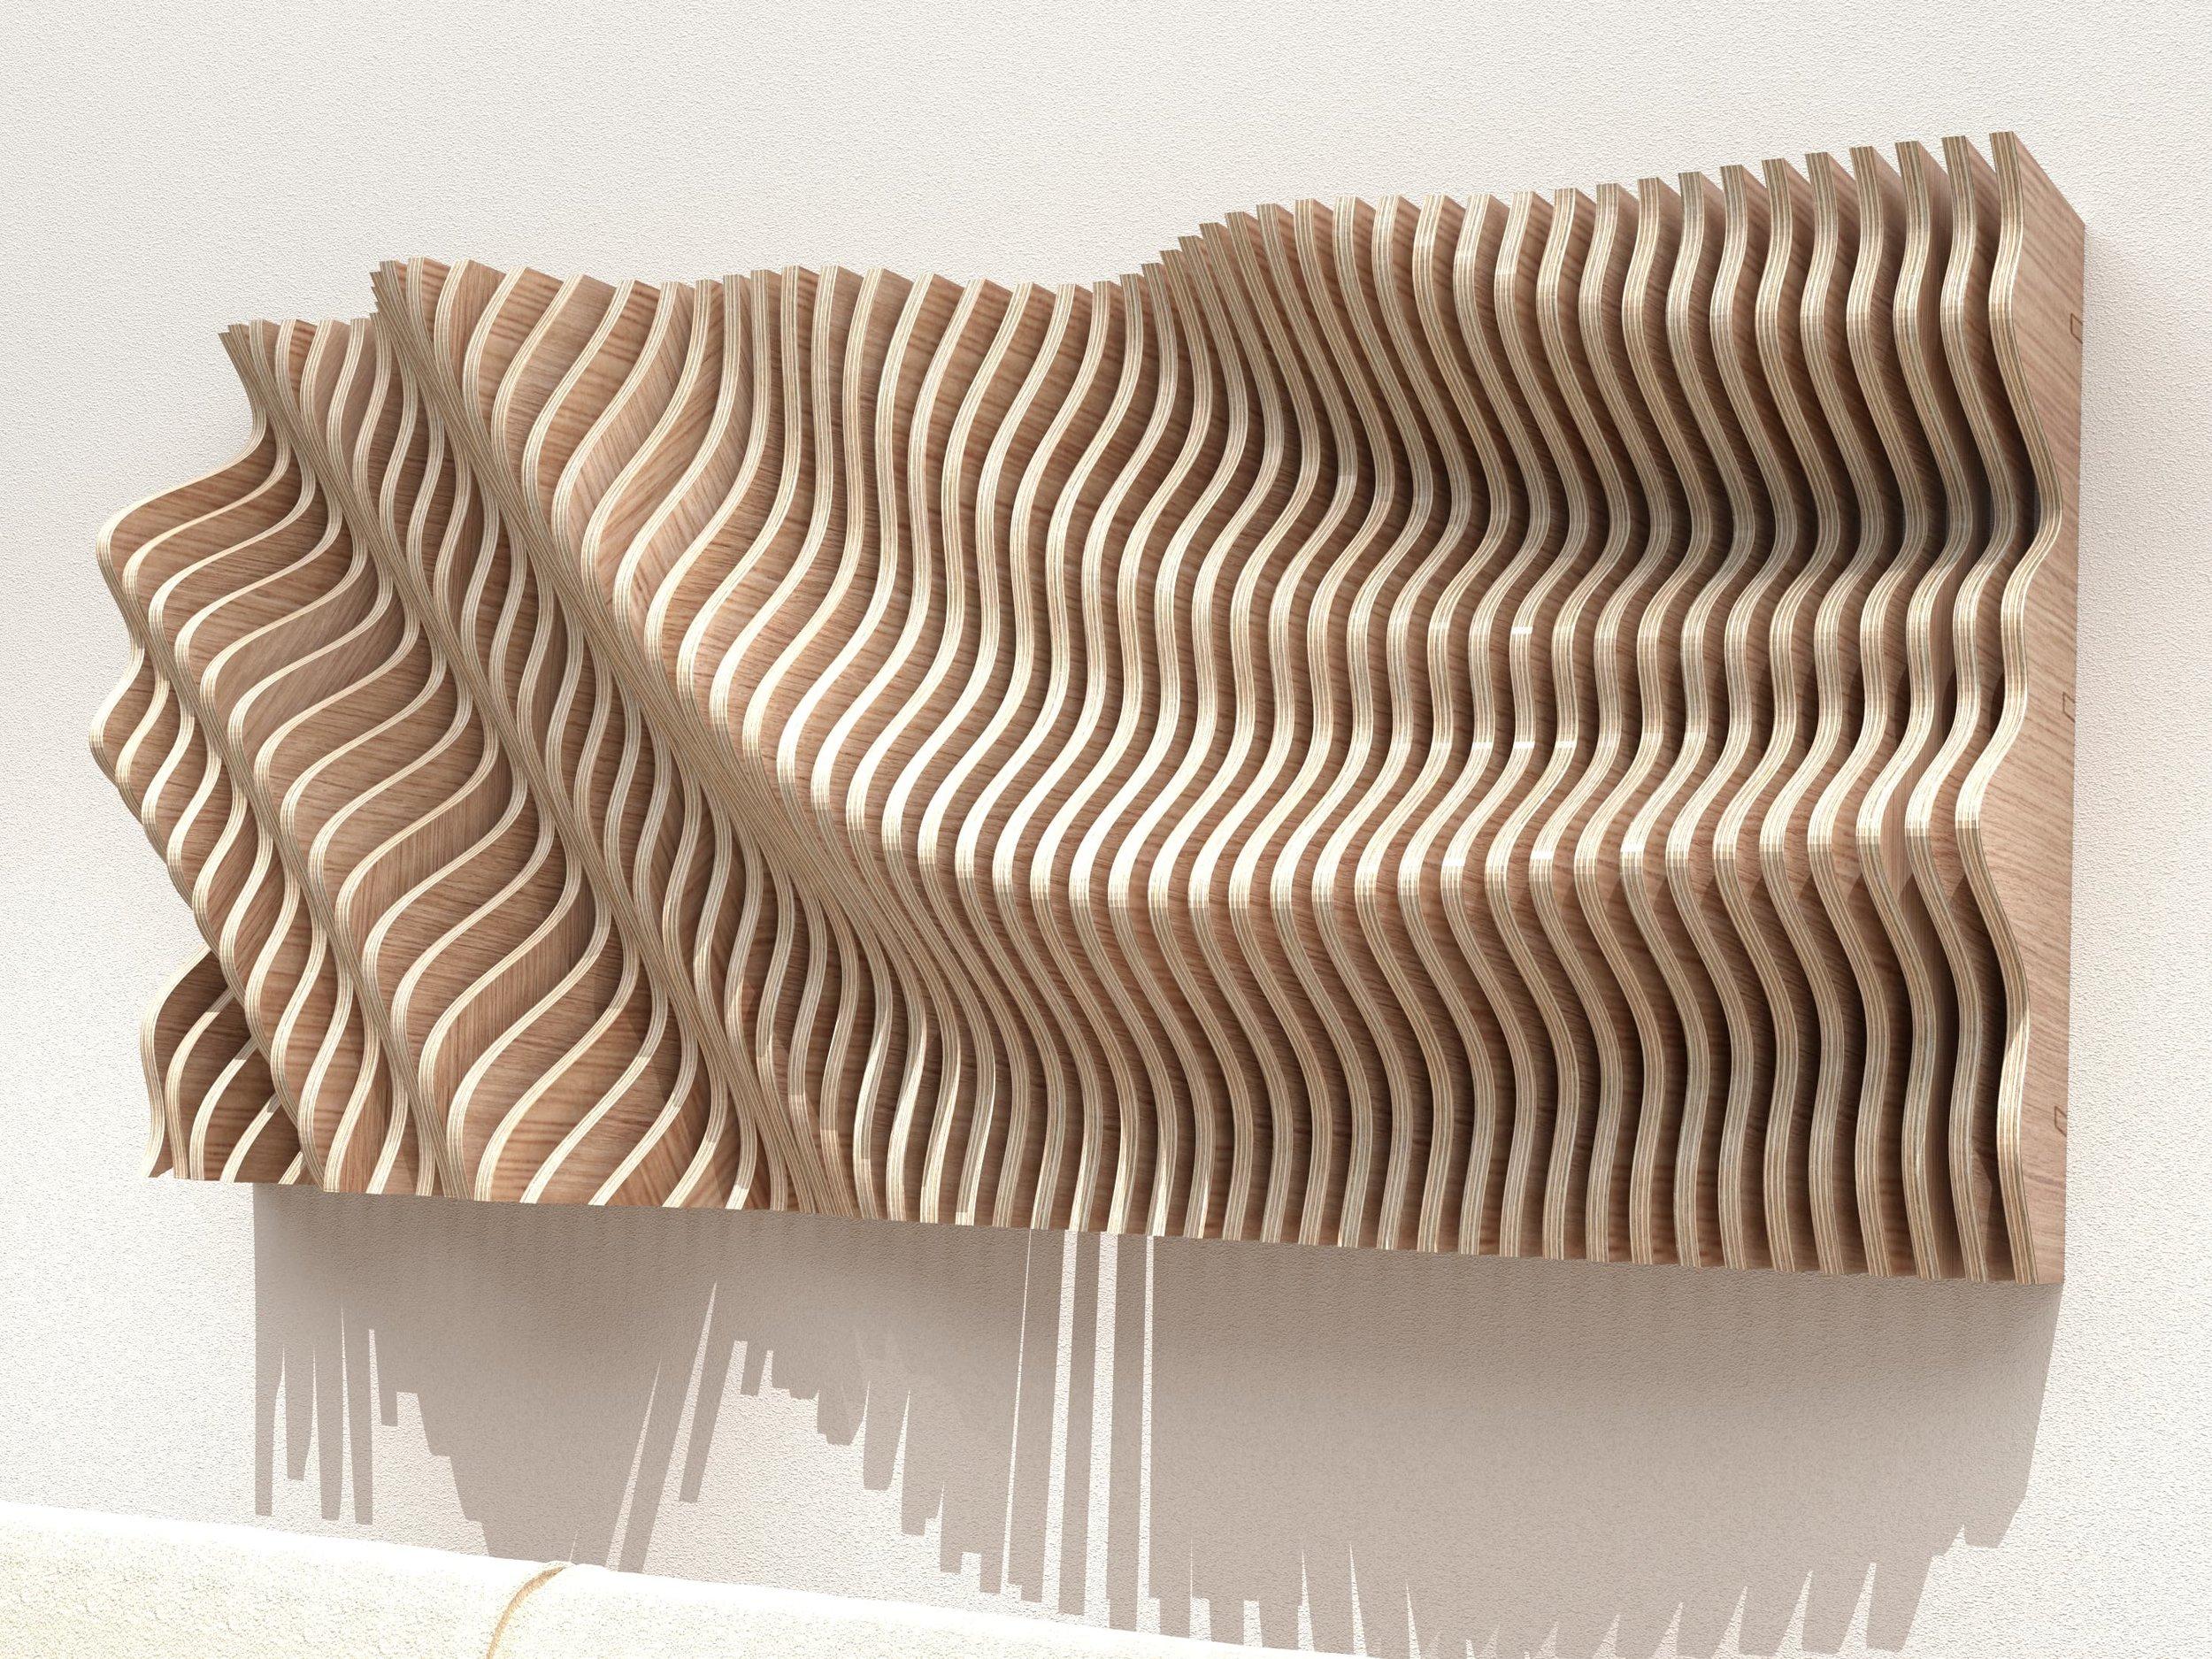 phoenix 3 – parametric cnc router postmodern organic geometric plywood wall fixture panno terraform design.jpg